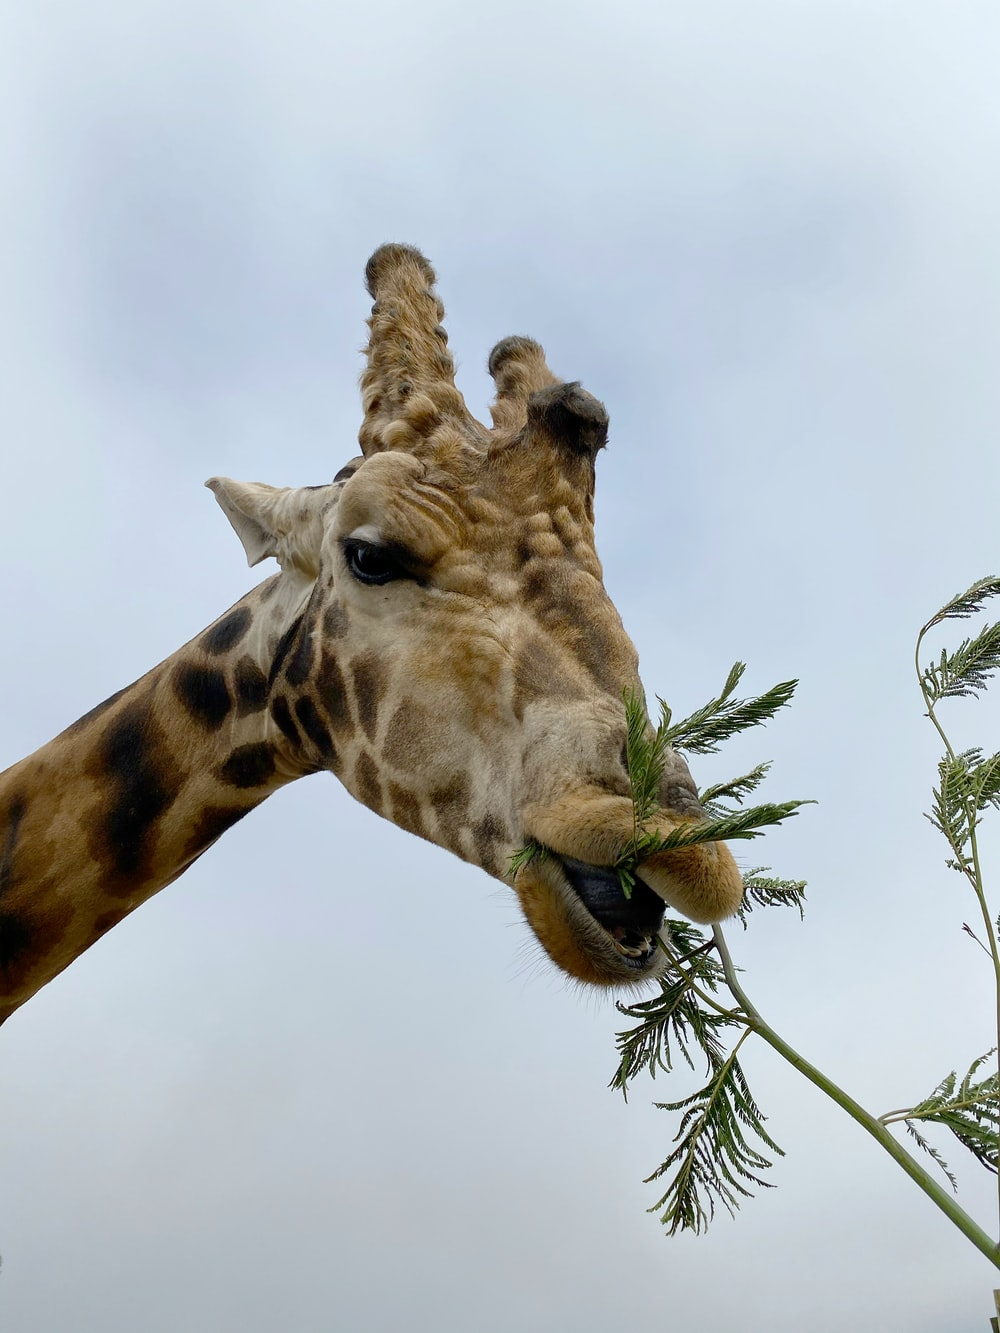 giraffe under white cloudy sky during daytime